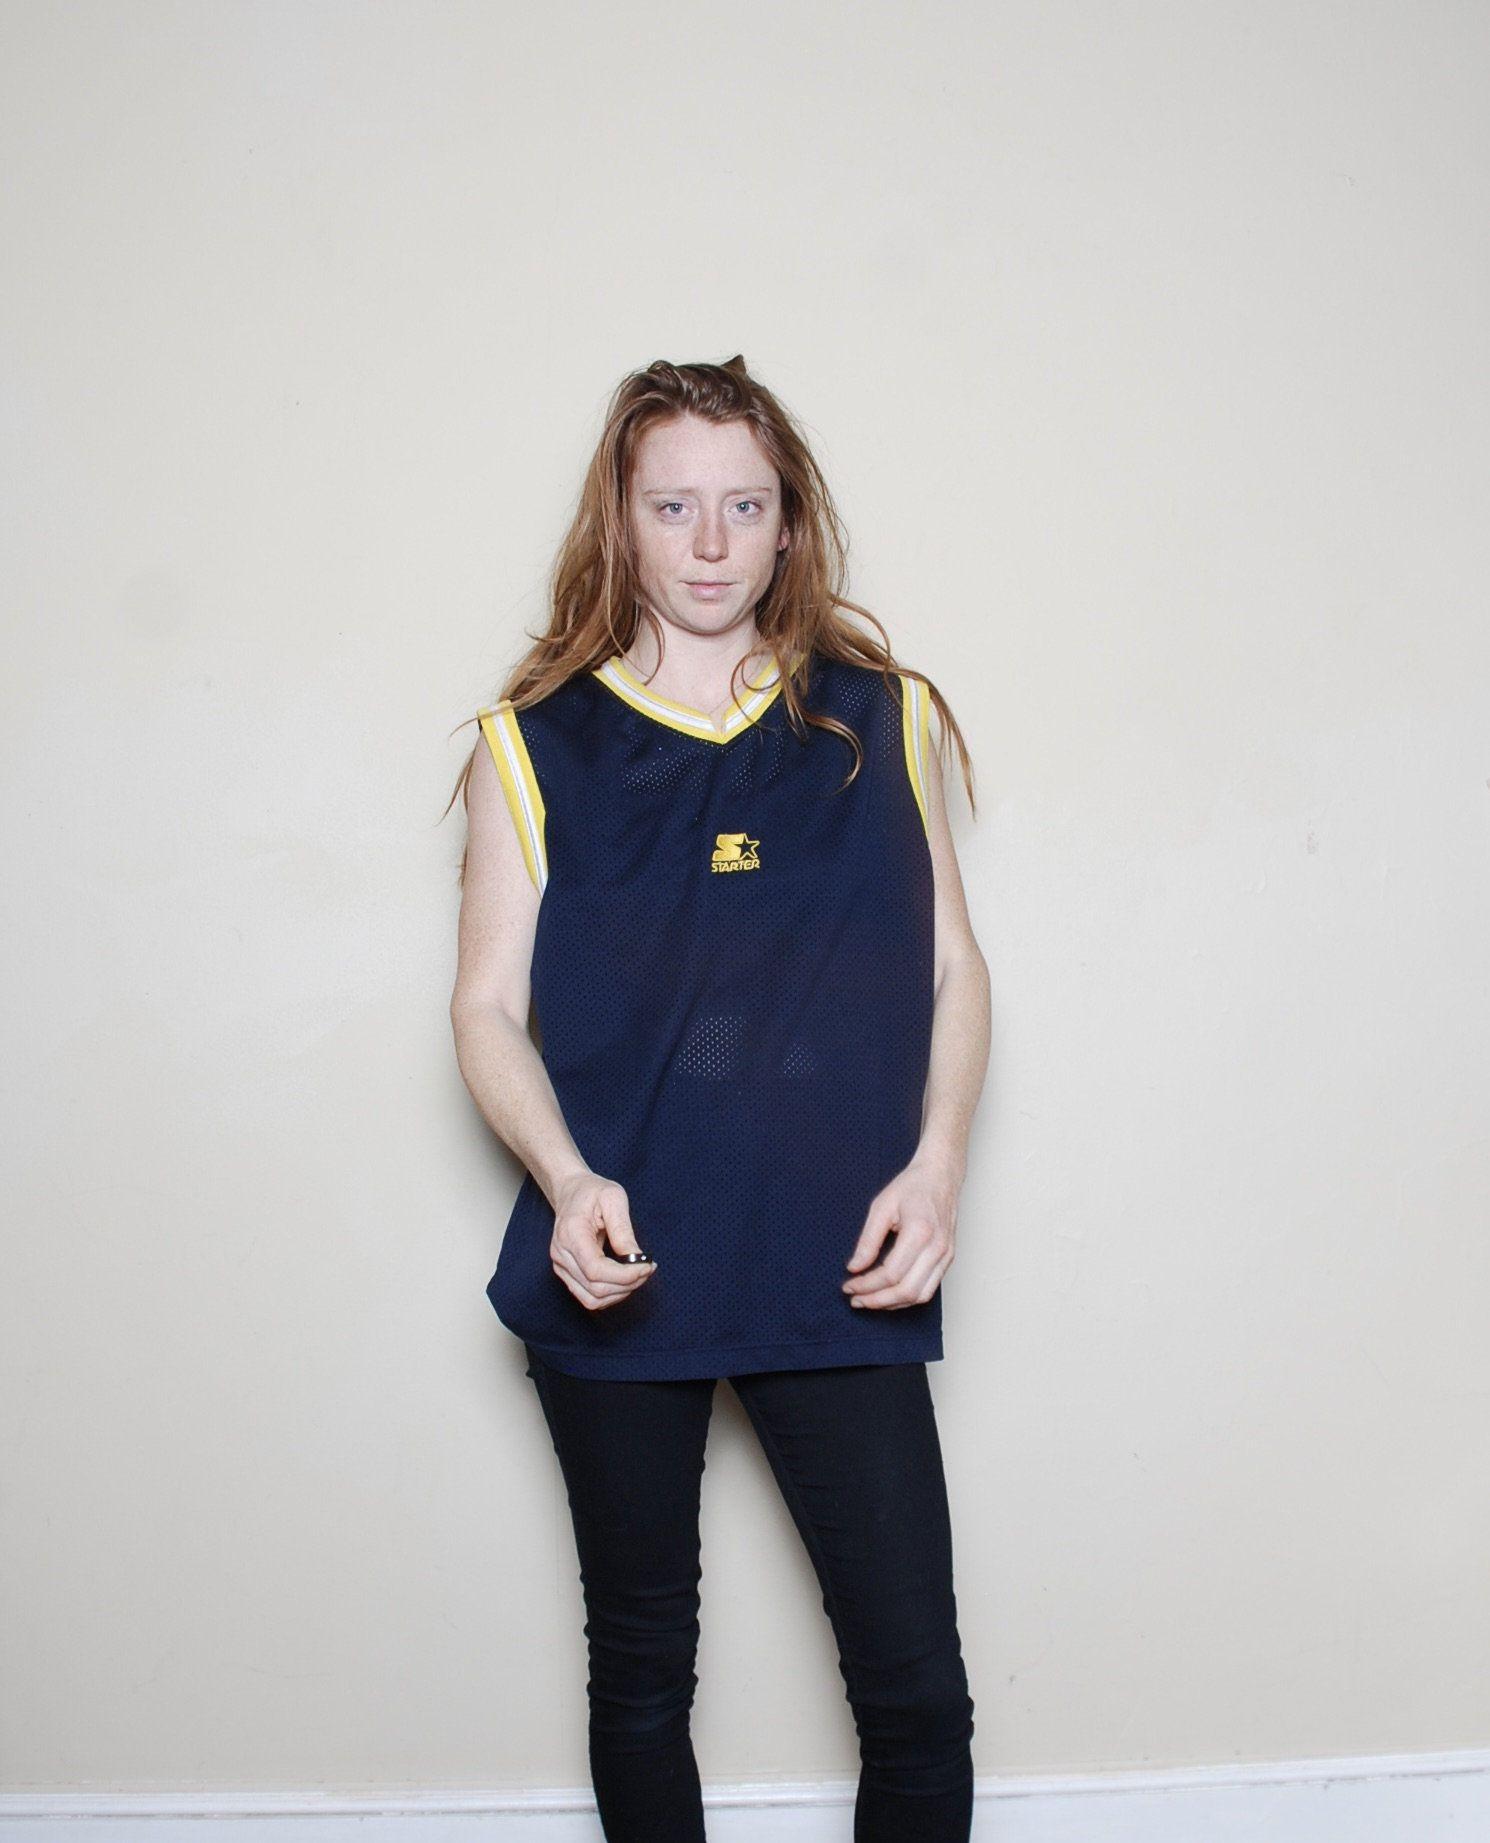 sports jersey dress sleeveless